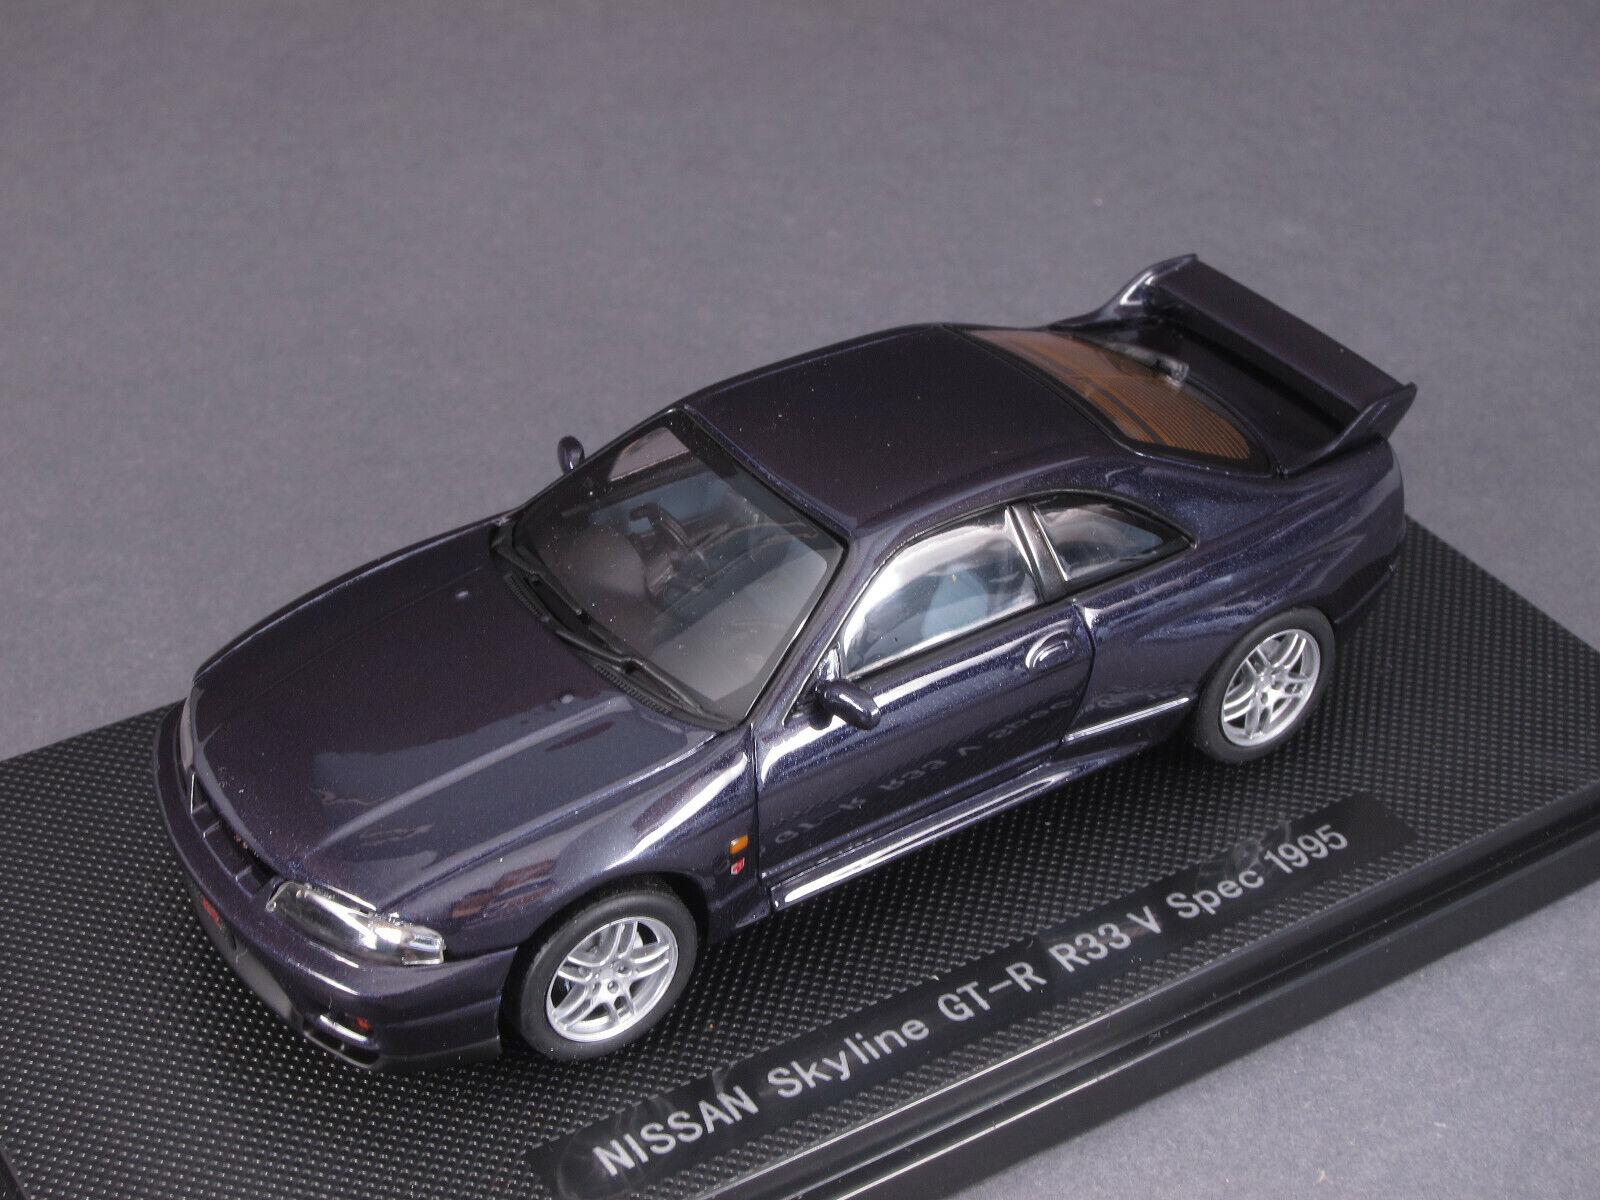 1 43 Ebbro NISSAN cieloLINE GT-R Vspec r33 1995-VIOLA - 44187 - 142097